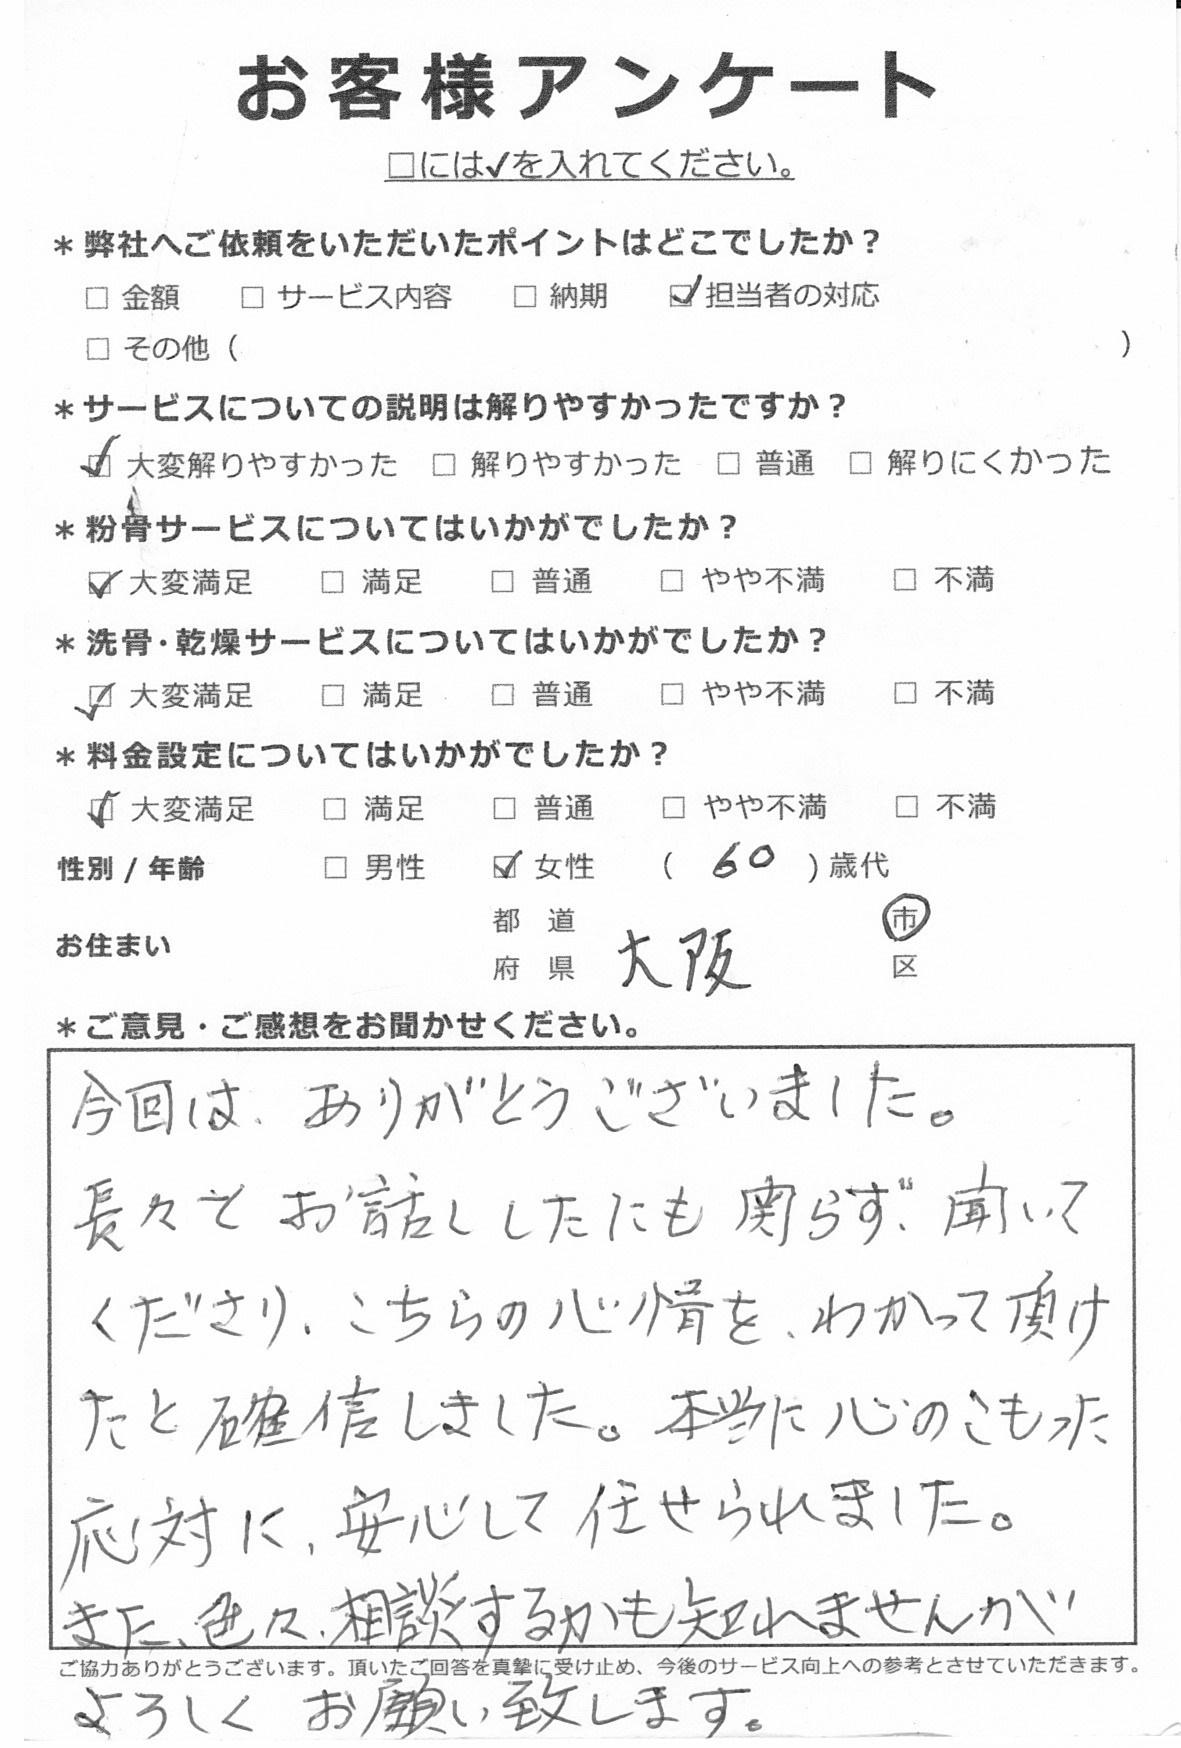 大阪市60代女性の粉骨事例